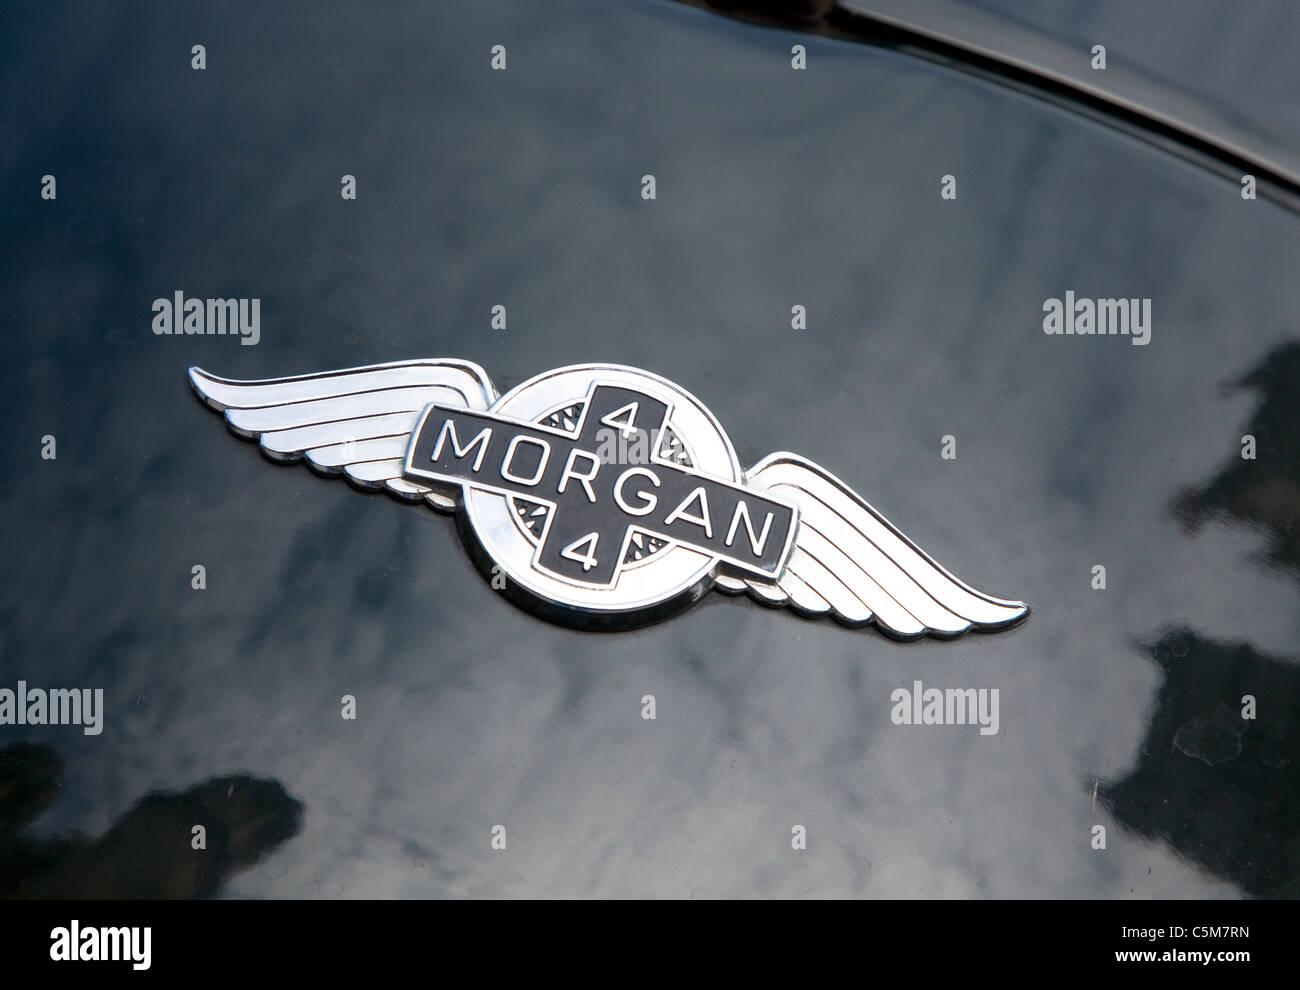 Badge on Morgan sports car, London - Stock Image